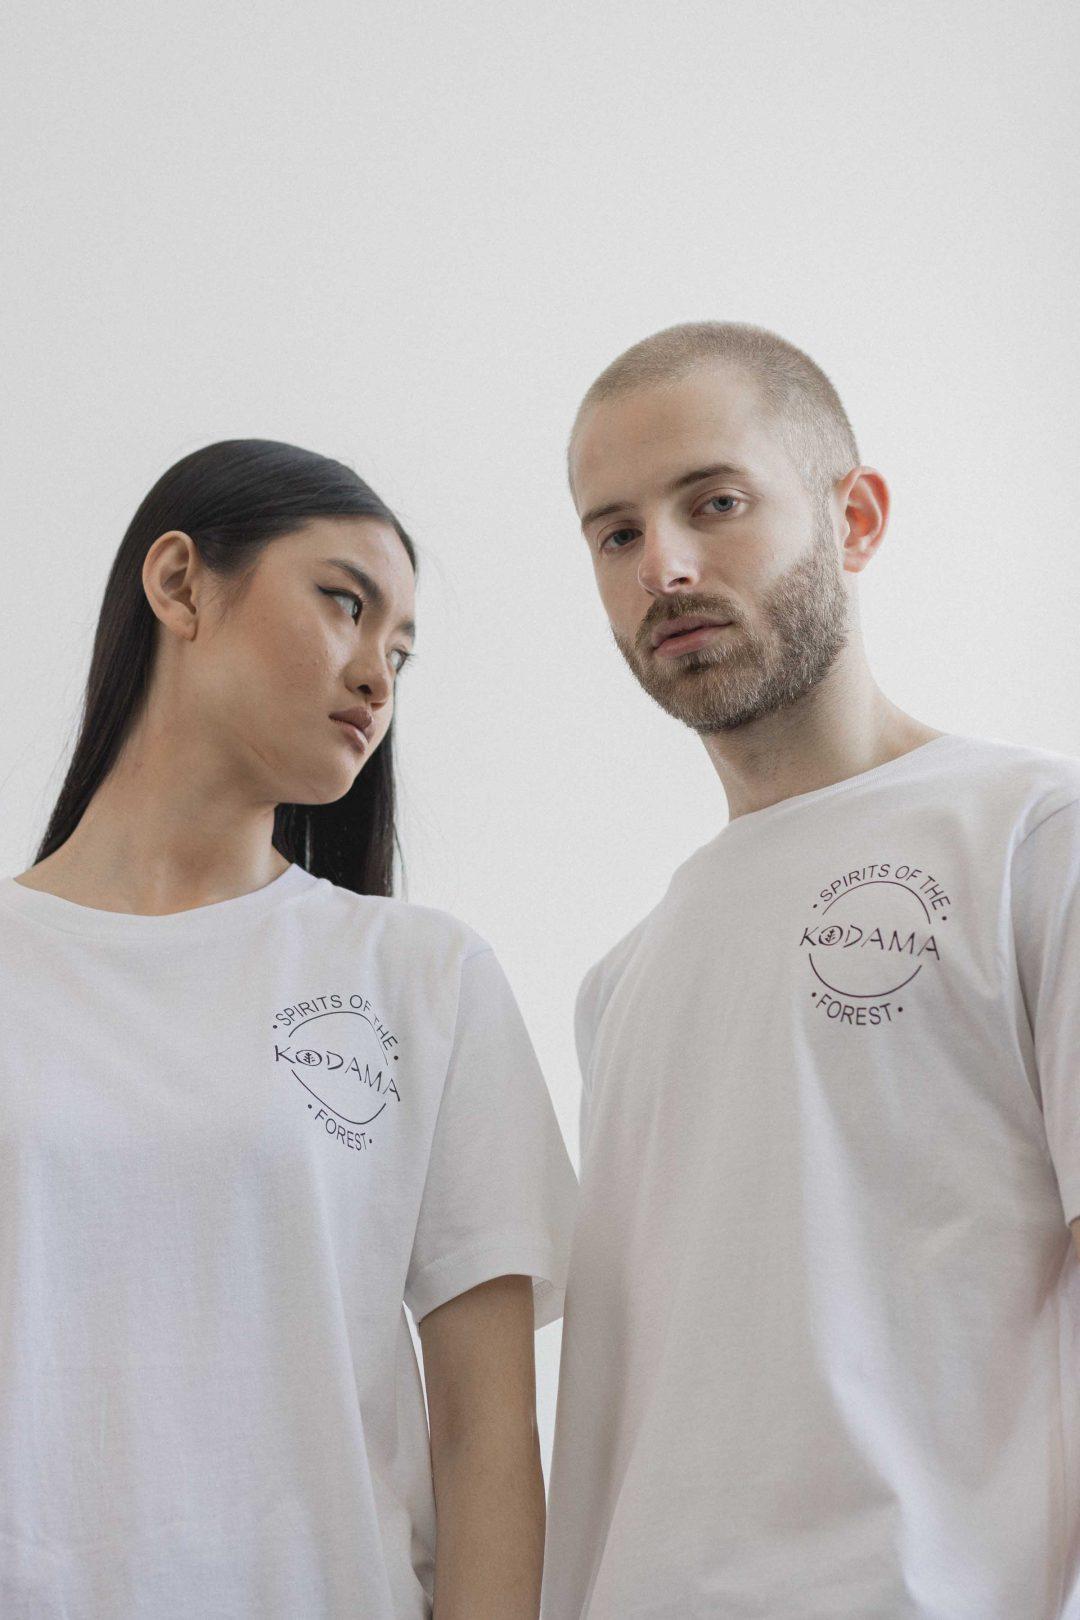 kodama apparel - kdm classic tee white2